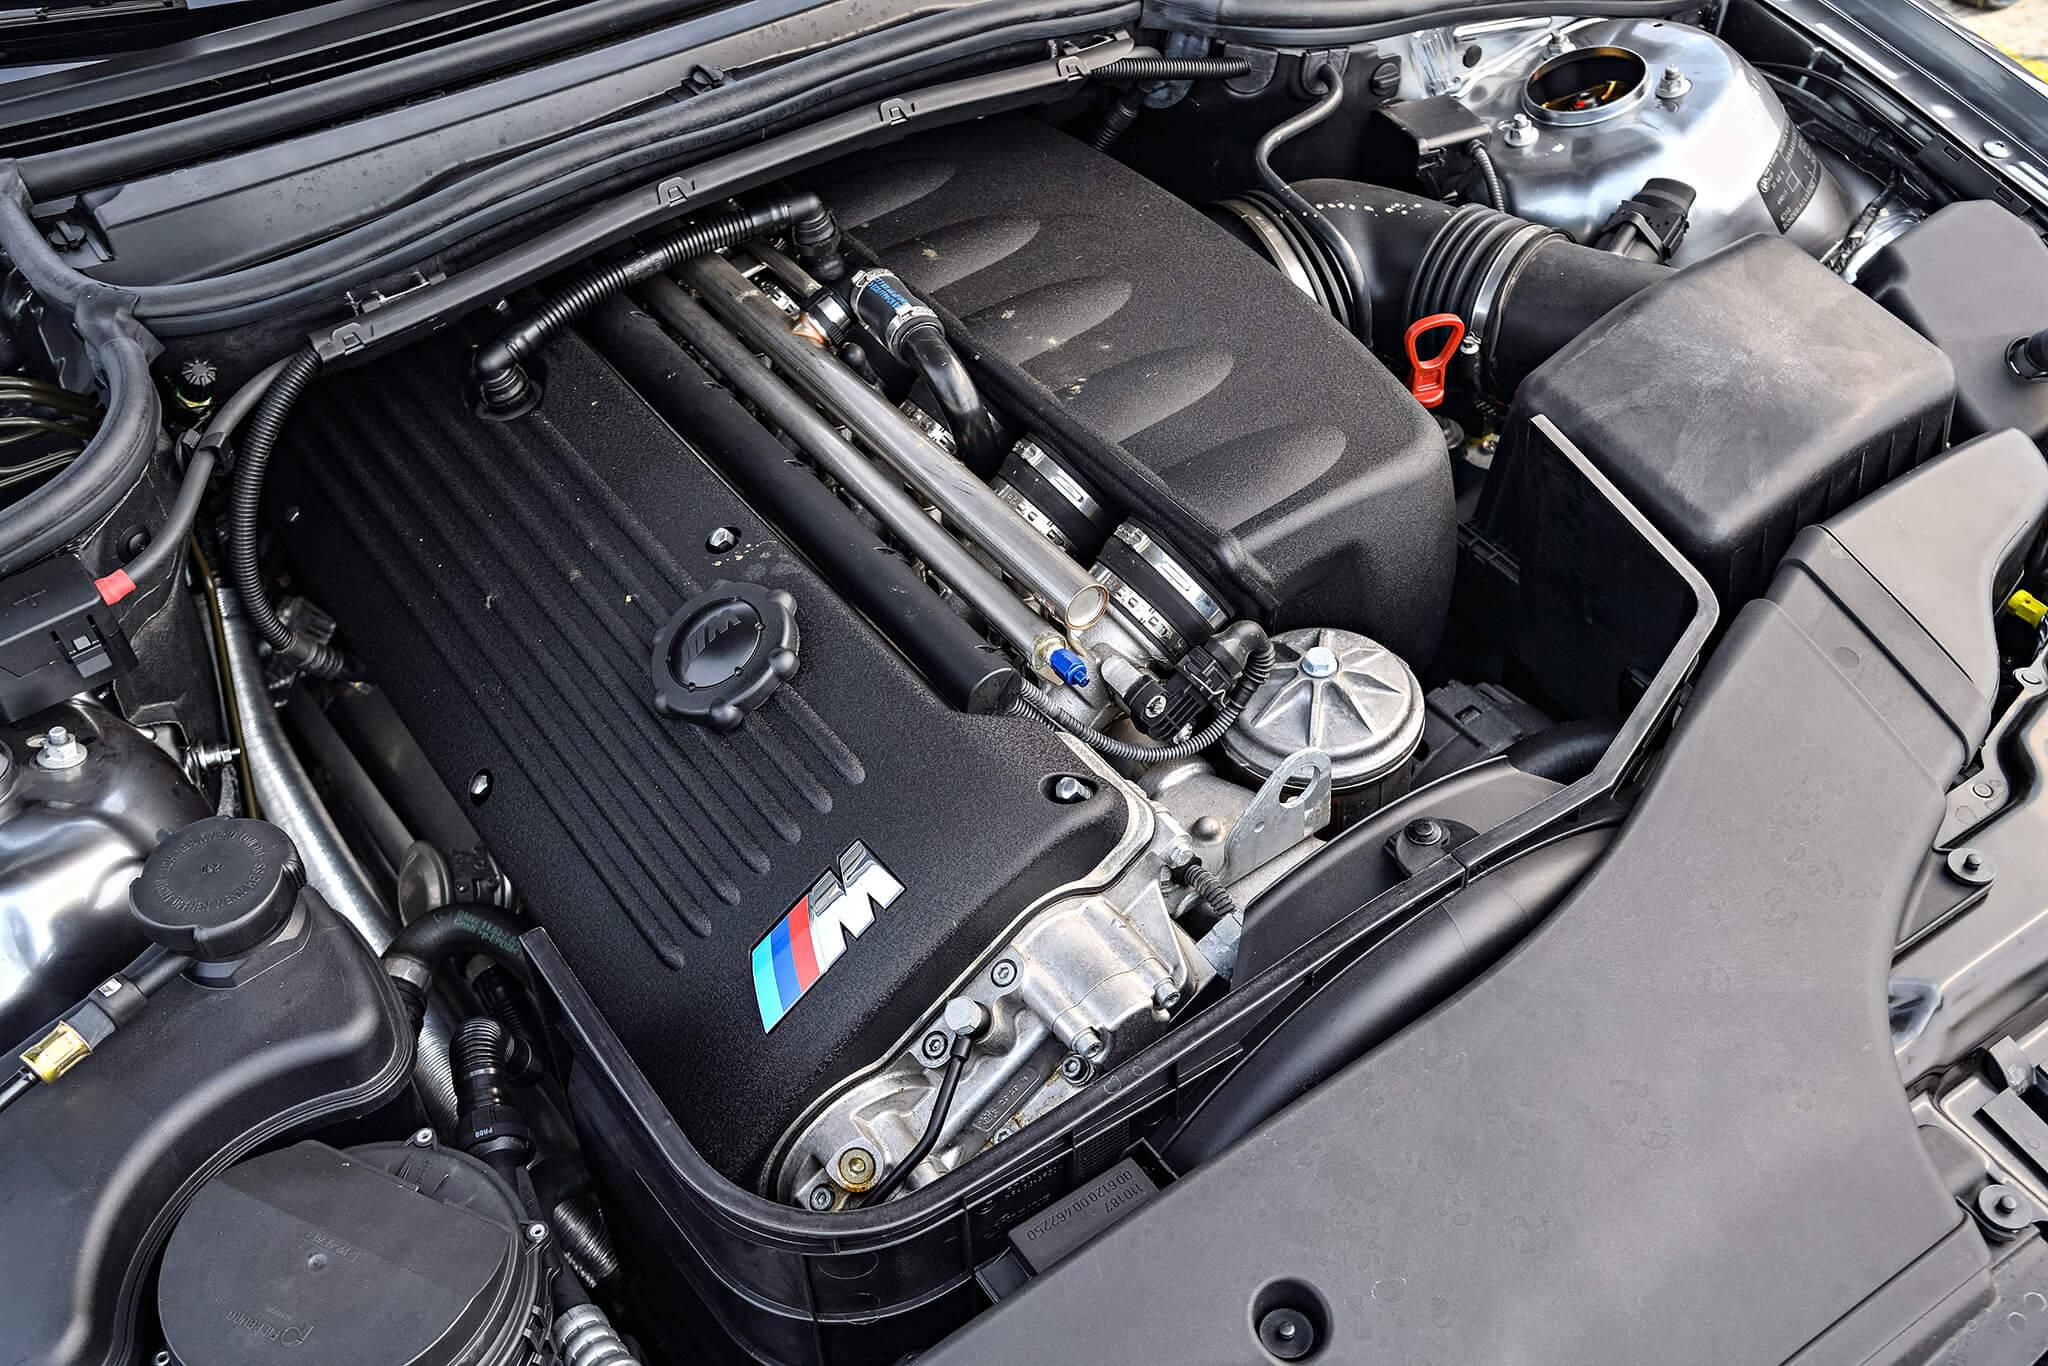 S54 motor